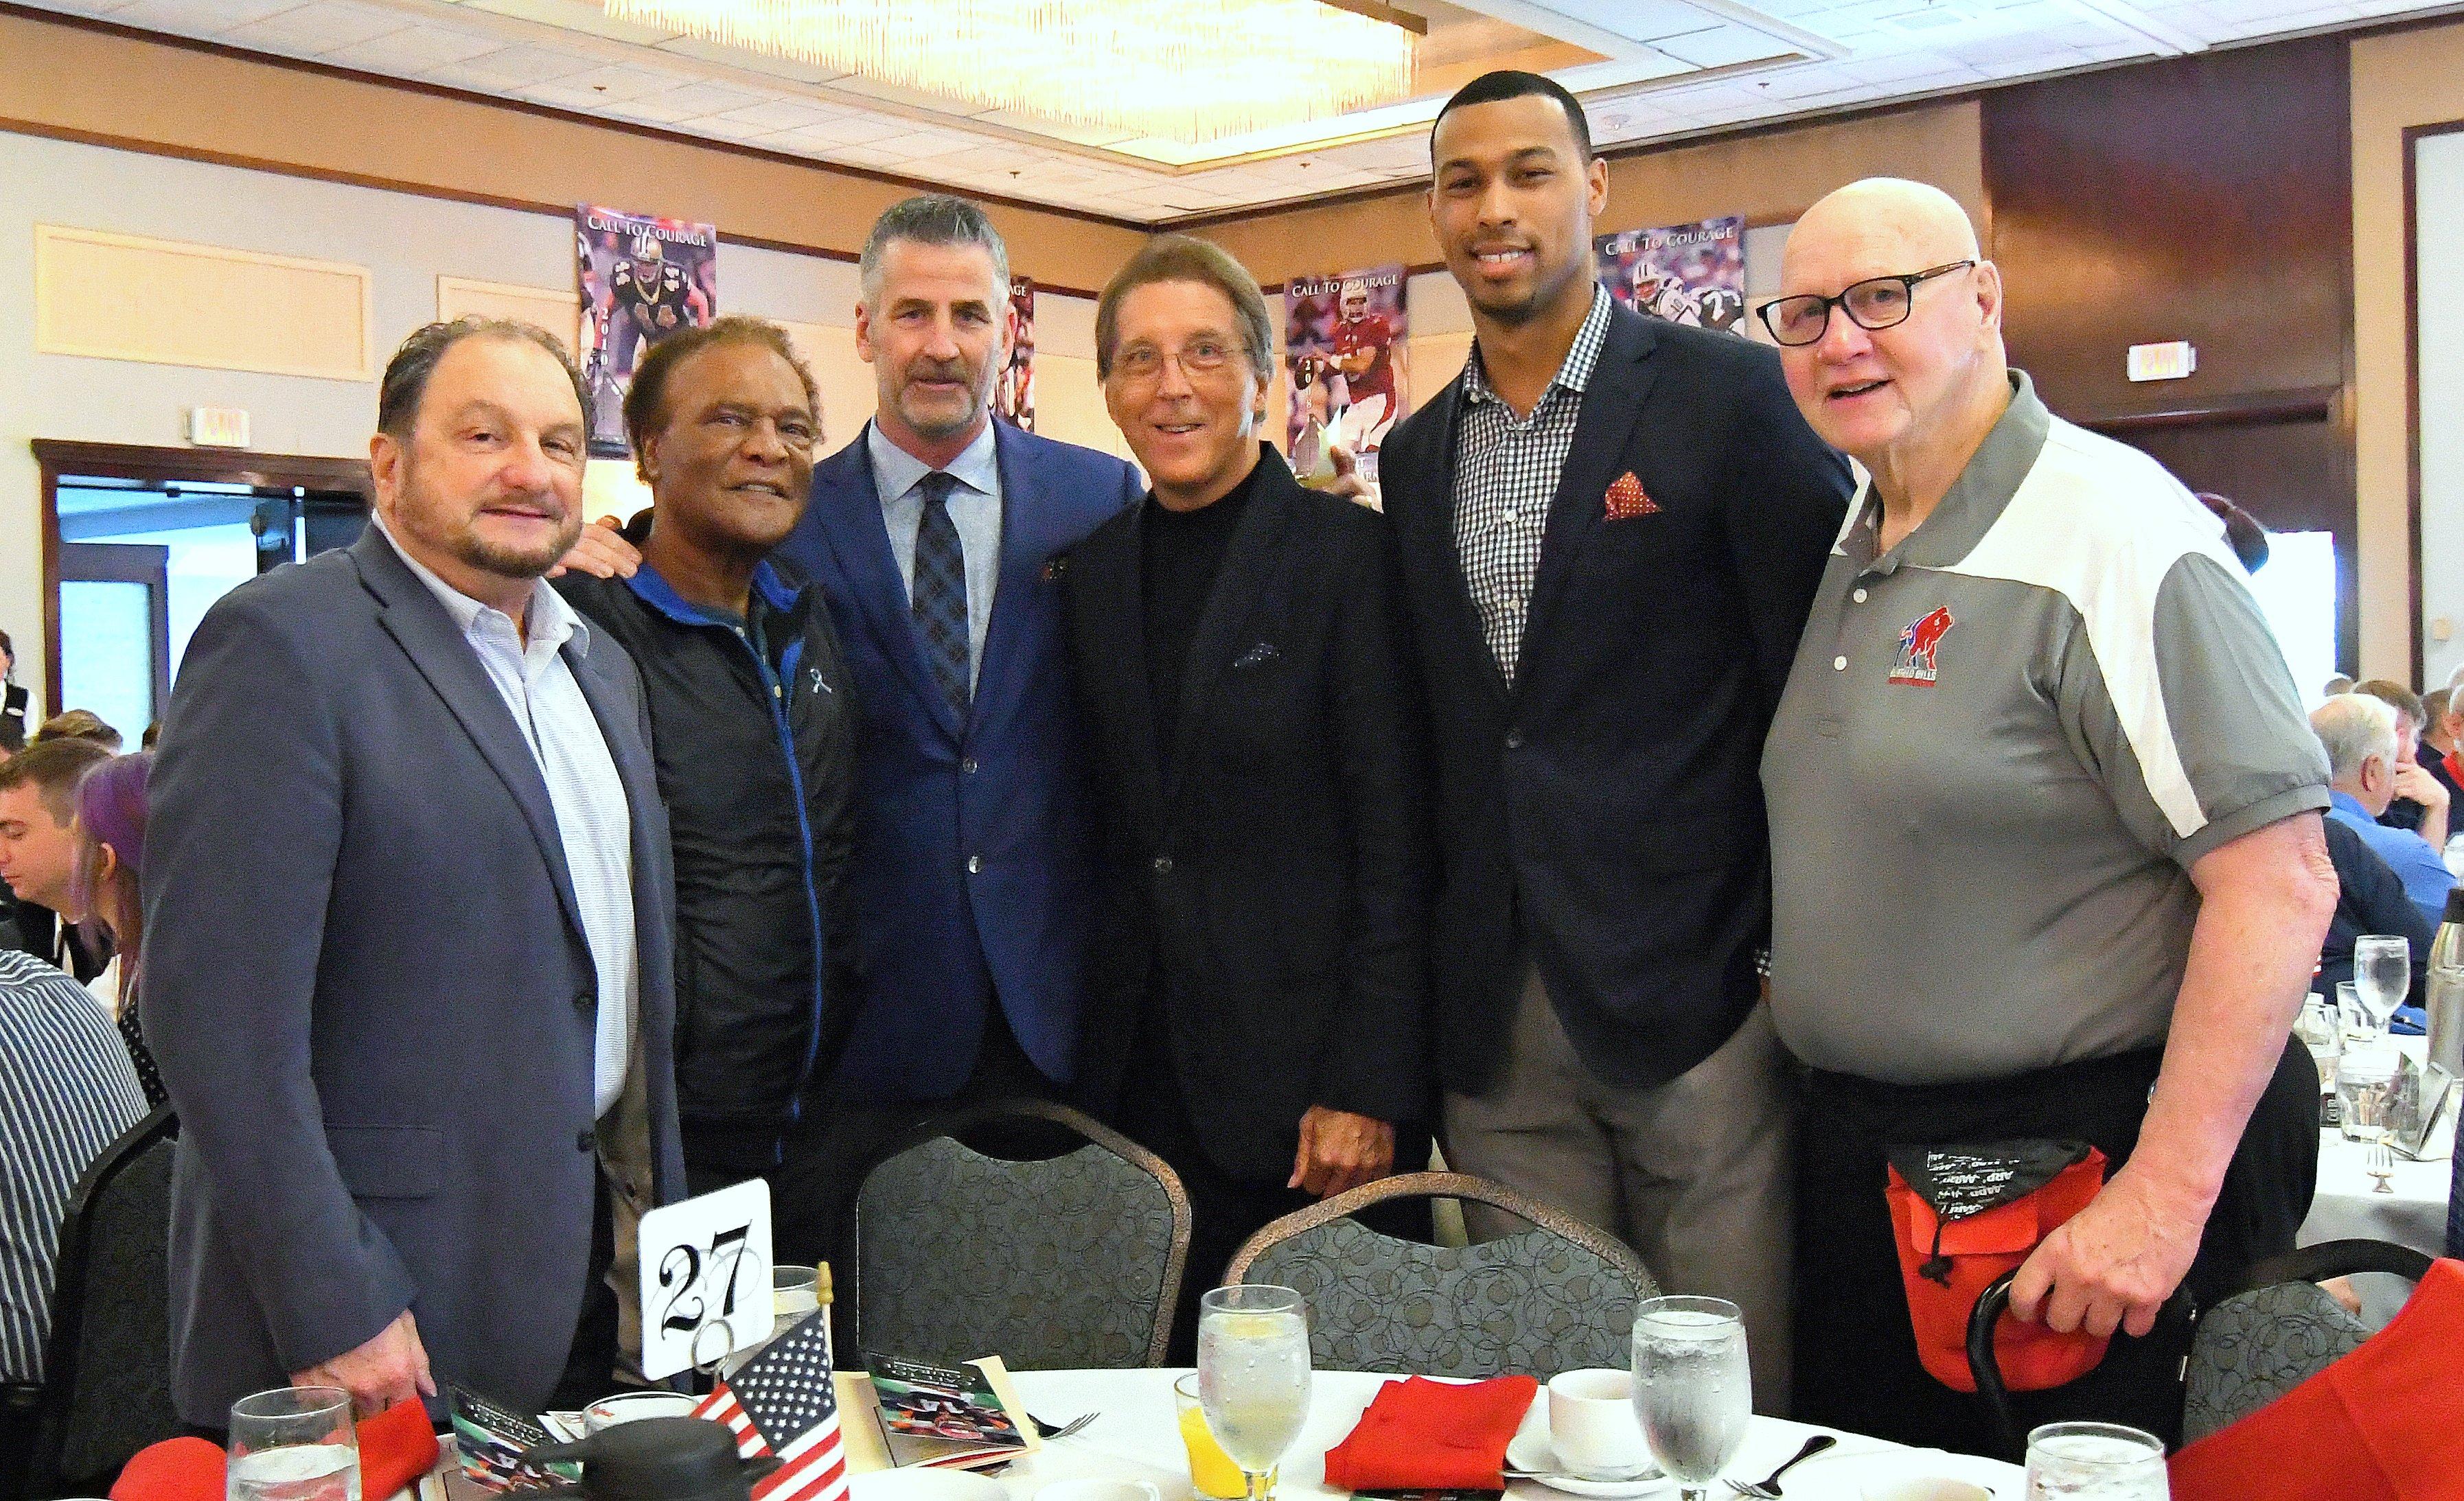 Bills Alumni attend the Call to Courage Awards Breakfast (l to r) Lou Piccone, Booker Edgerson, Frank Reich, Ed Rutkowski, Jeremy Kelley & Bob Dugan